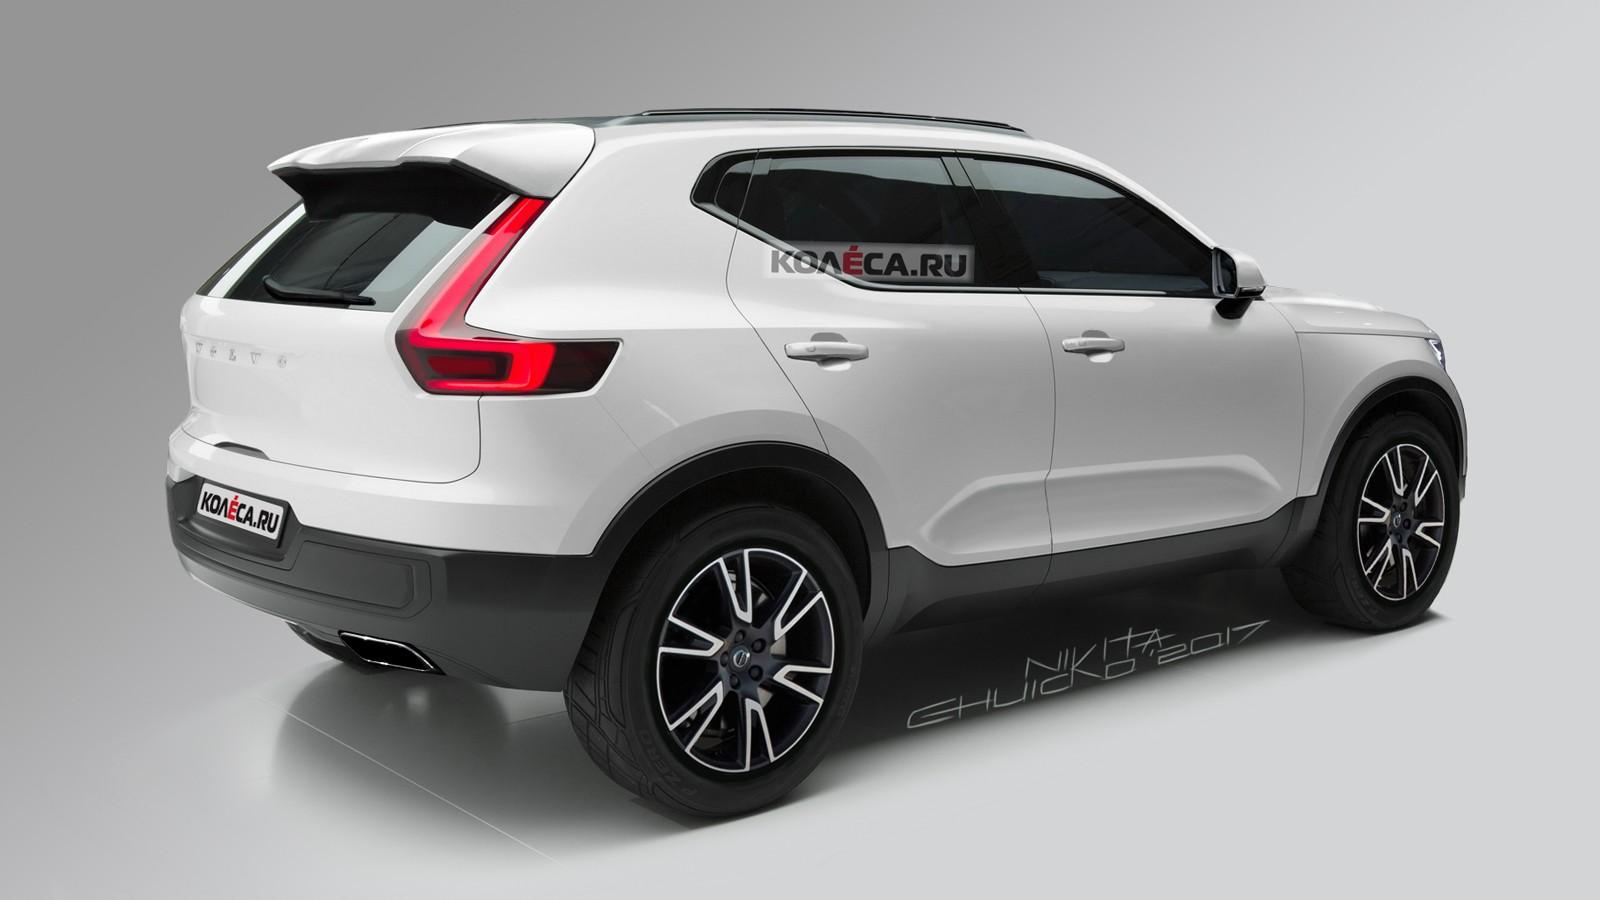 Volvo XC40 rear